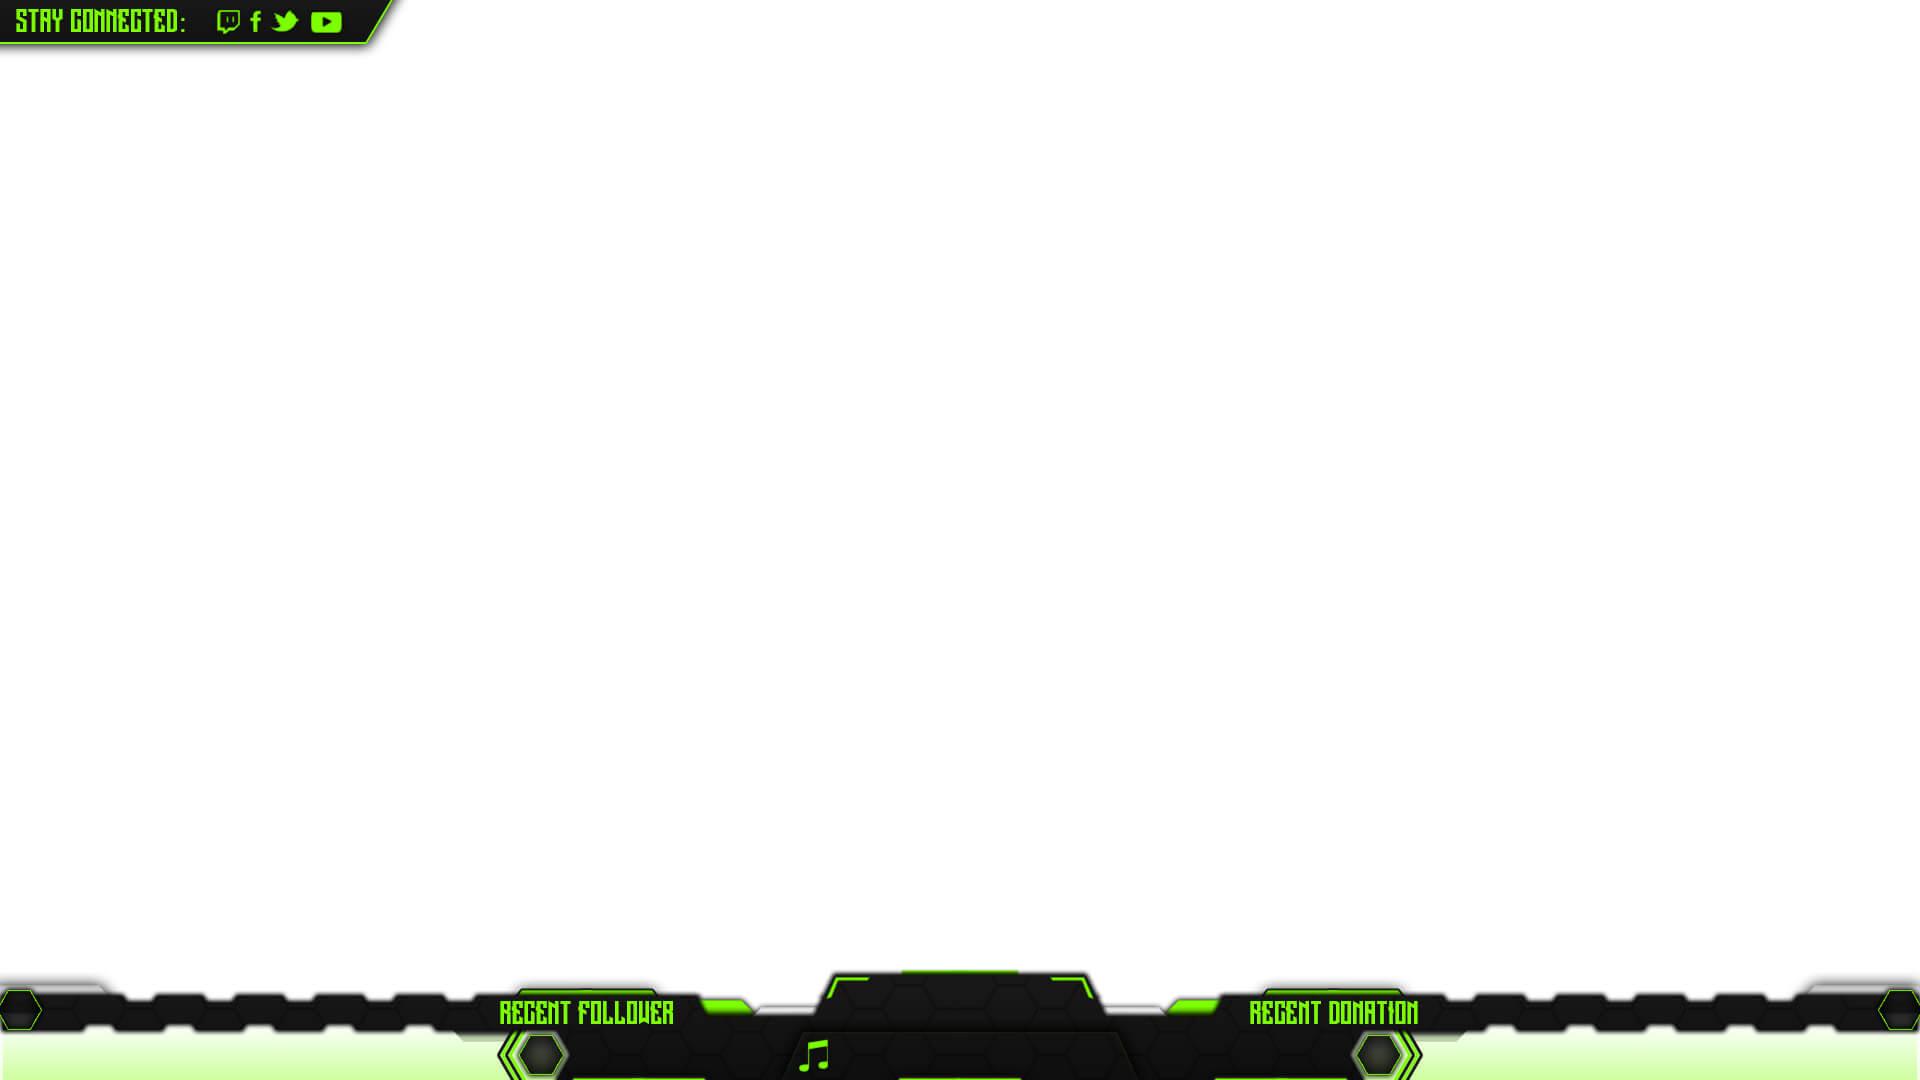 csgo overlay green 1920x1080 - photo #2